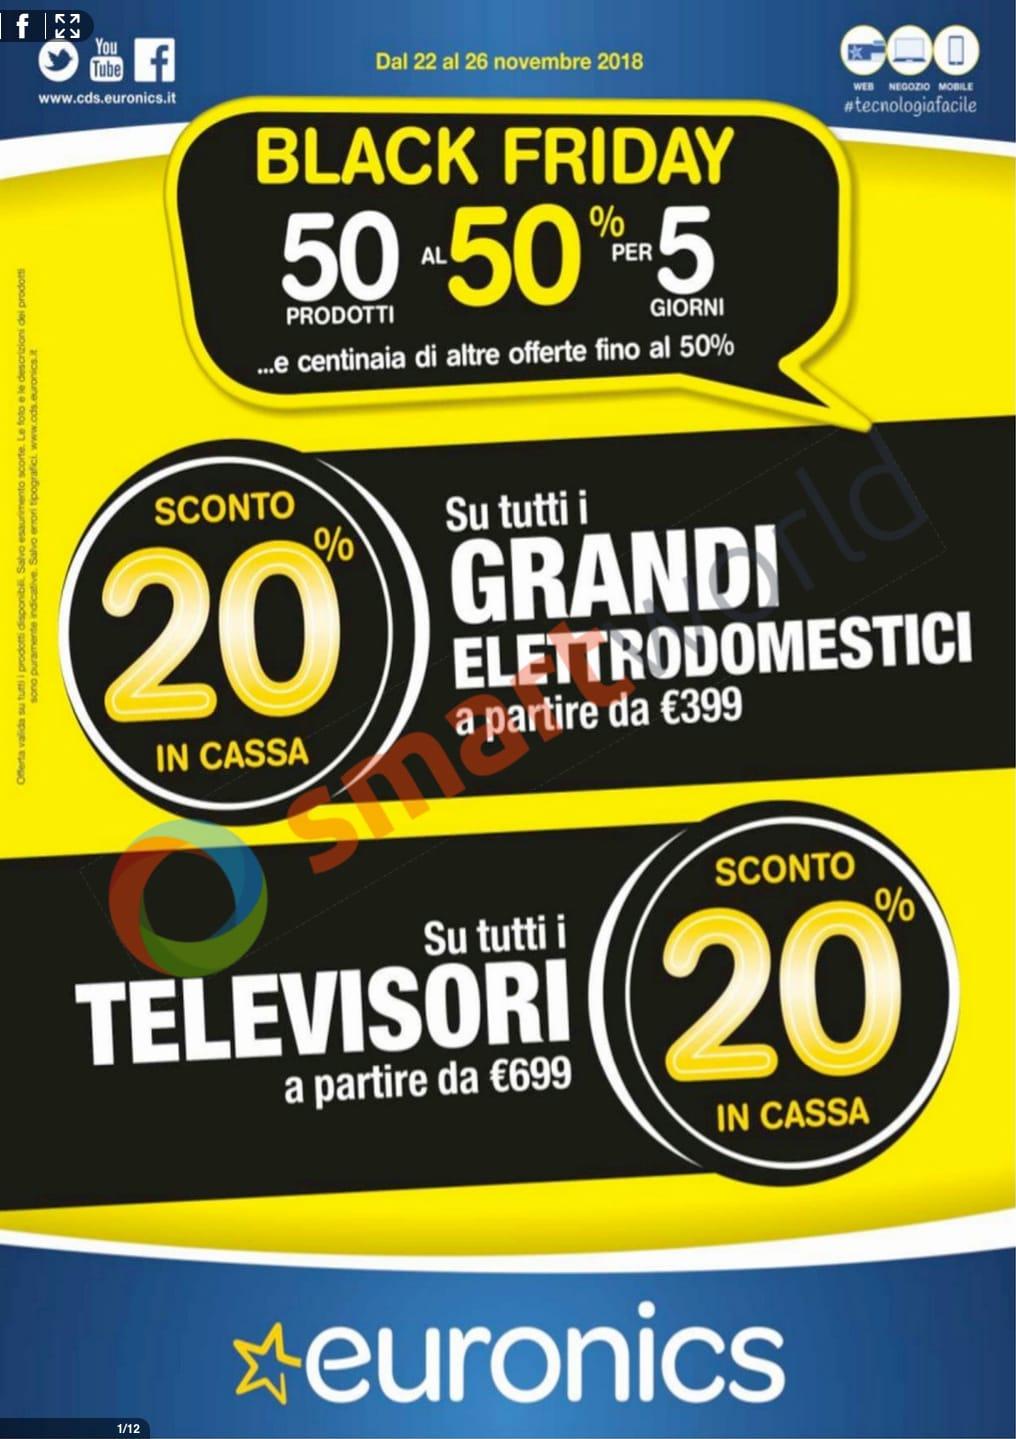 Volantino Euronics Black Friday 1